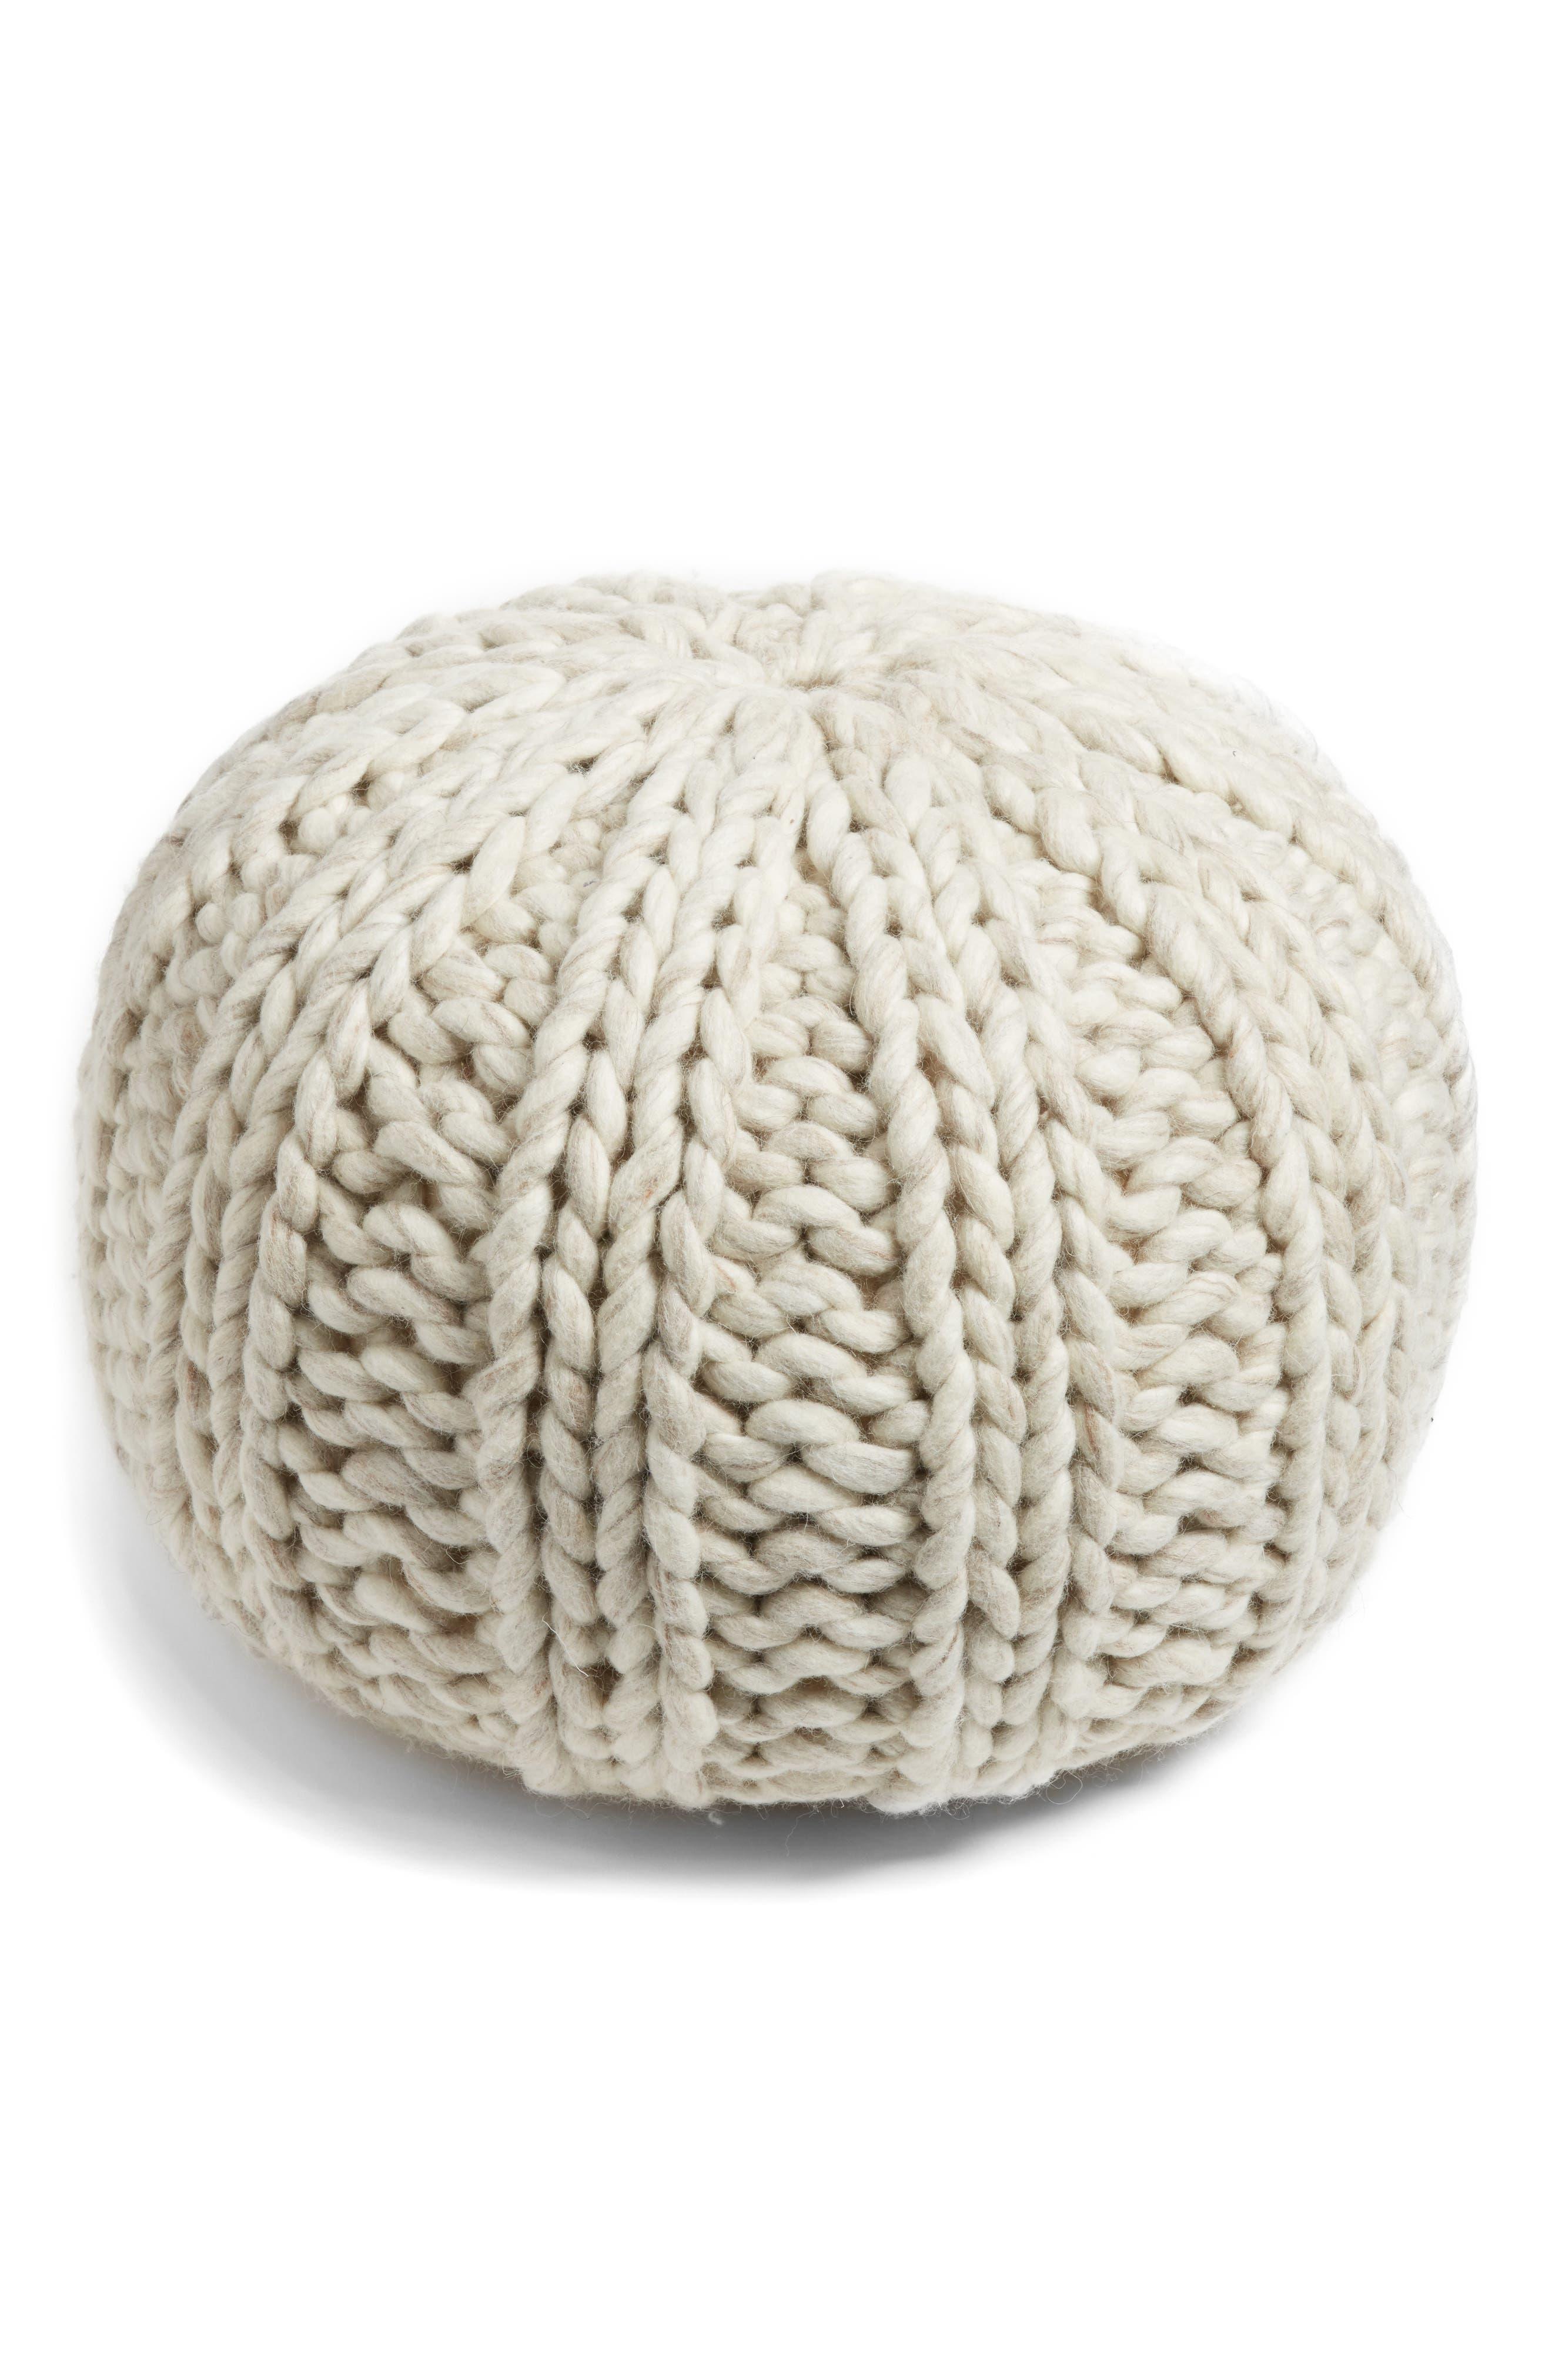 Chunky Knit Pouf,                             Main thumbnail 1, color,                             Ivory